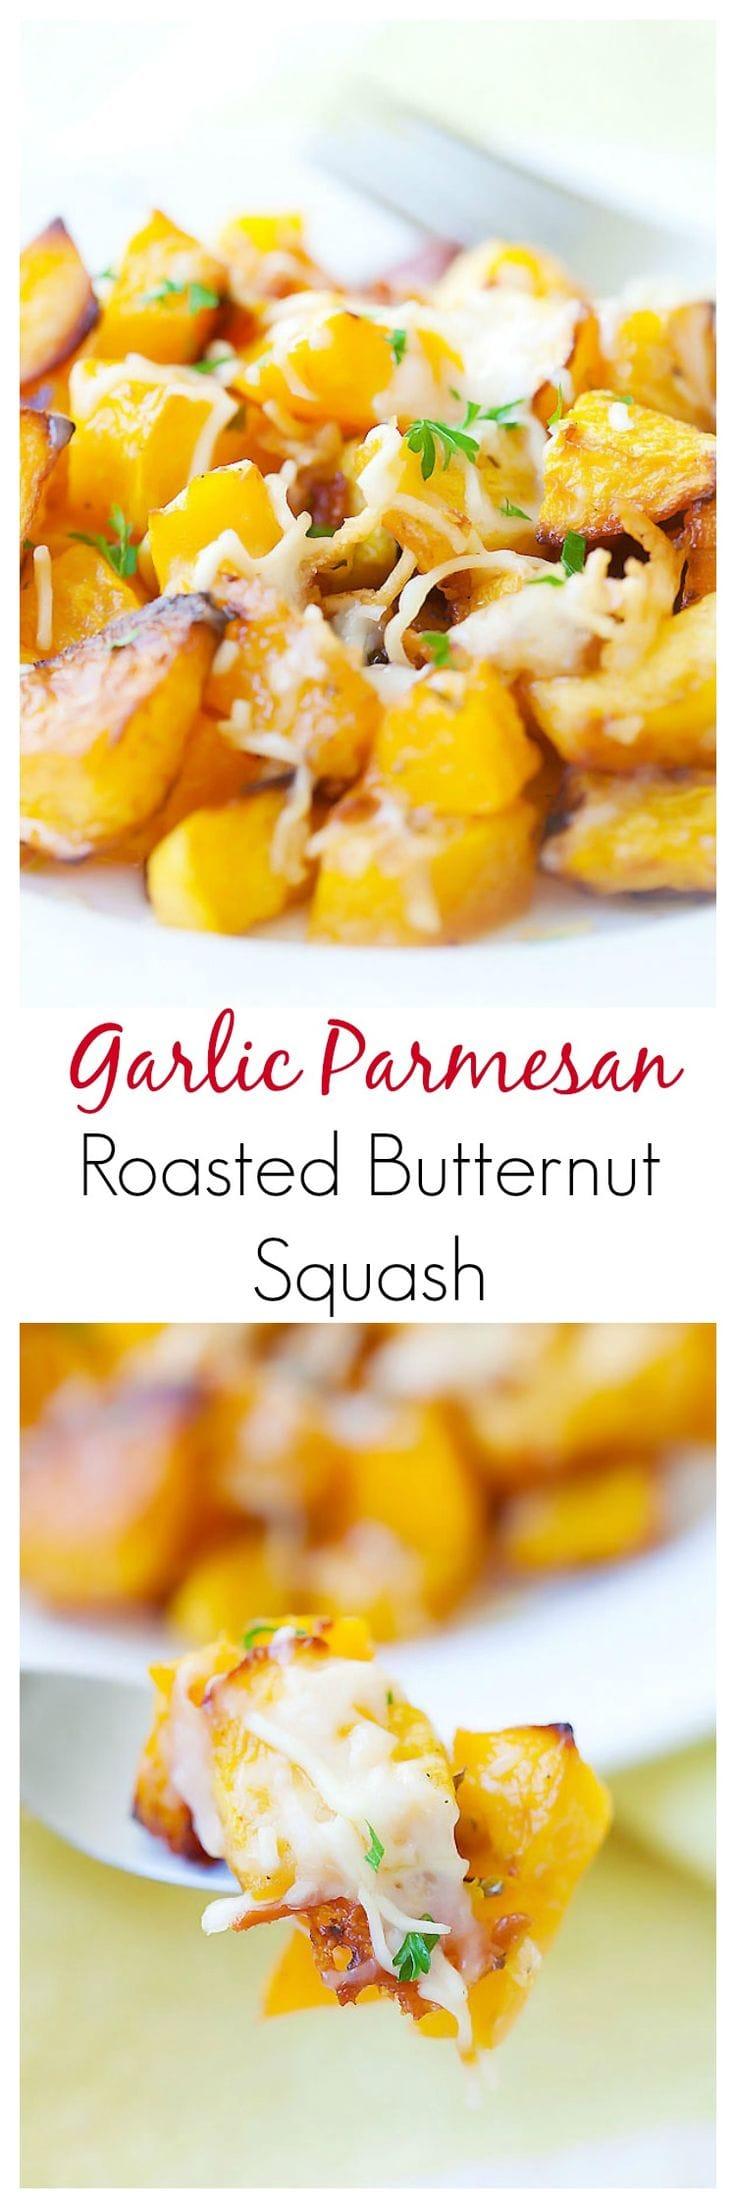 Garlic Parmesan Roasted Butternut squash – sweet tender butternut squash roasted with butter, garlic & Parmesan cheese. So AMAZING you want it every day   rasamalaysia.com